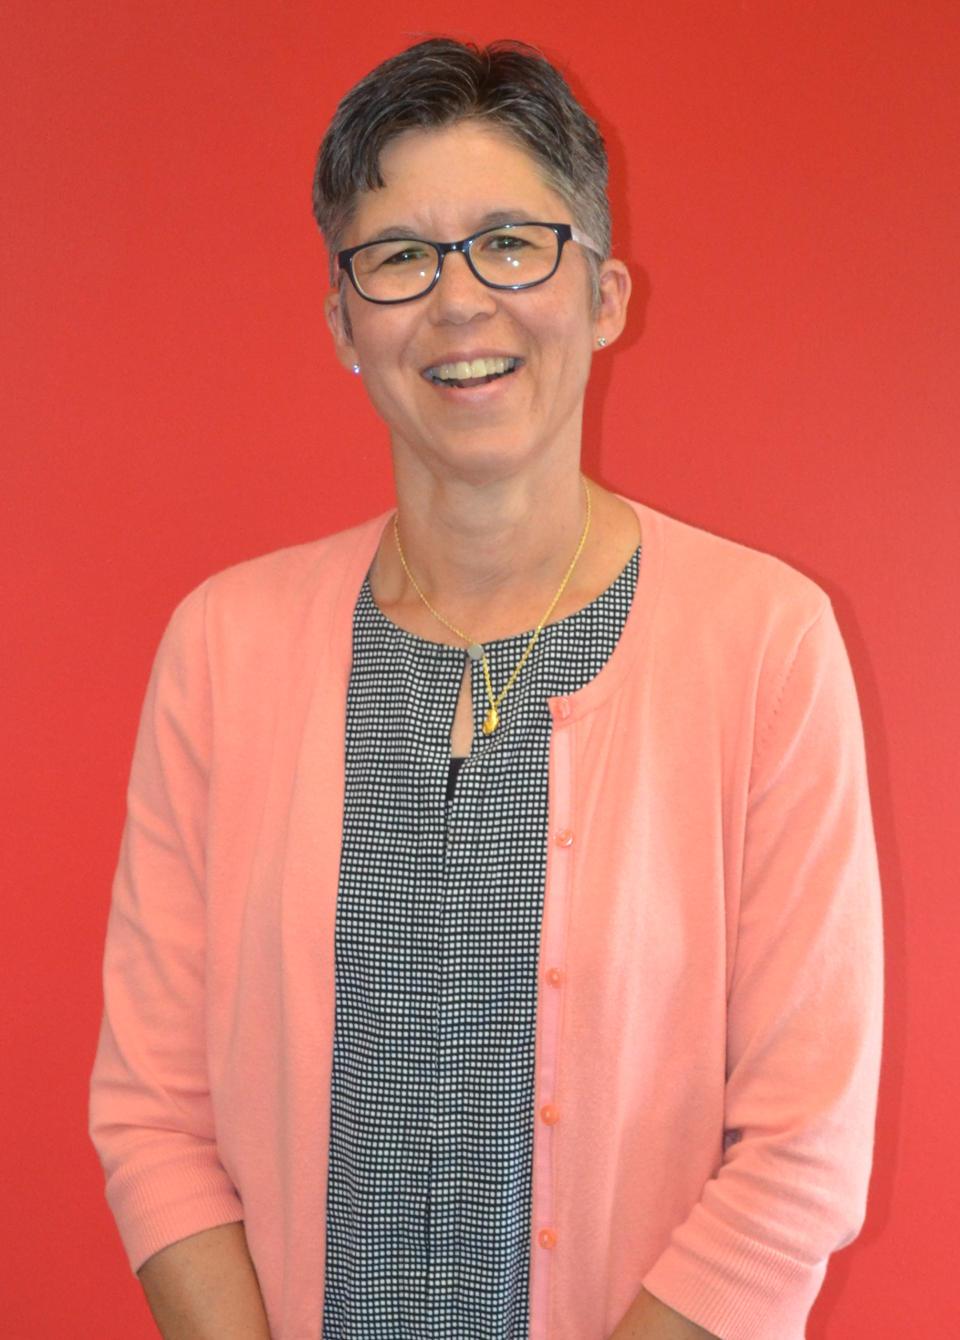 Kathy Burdick